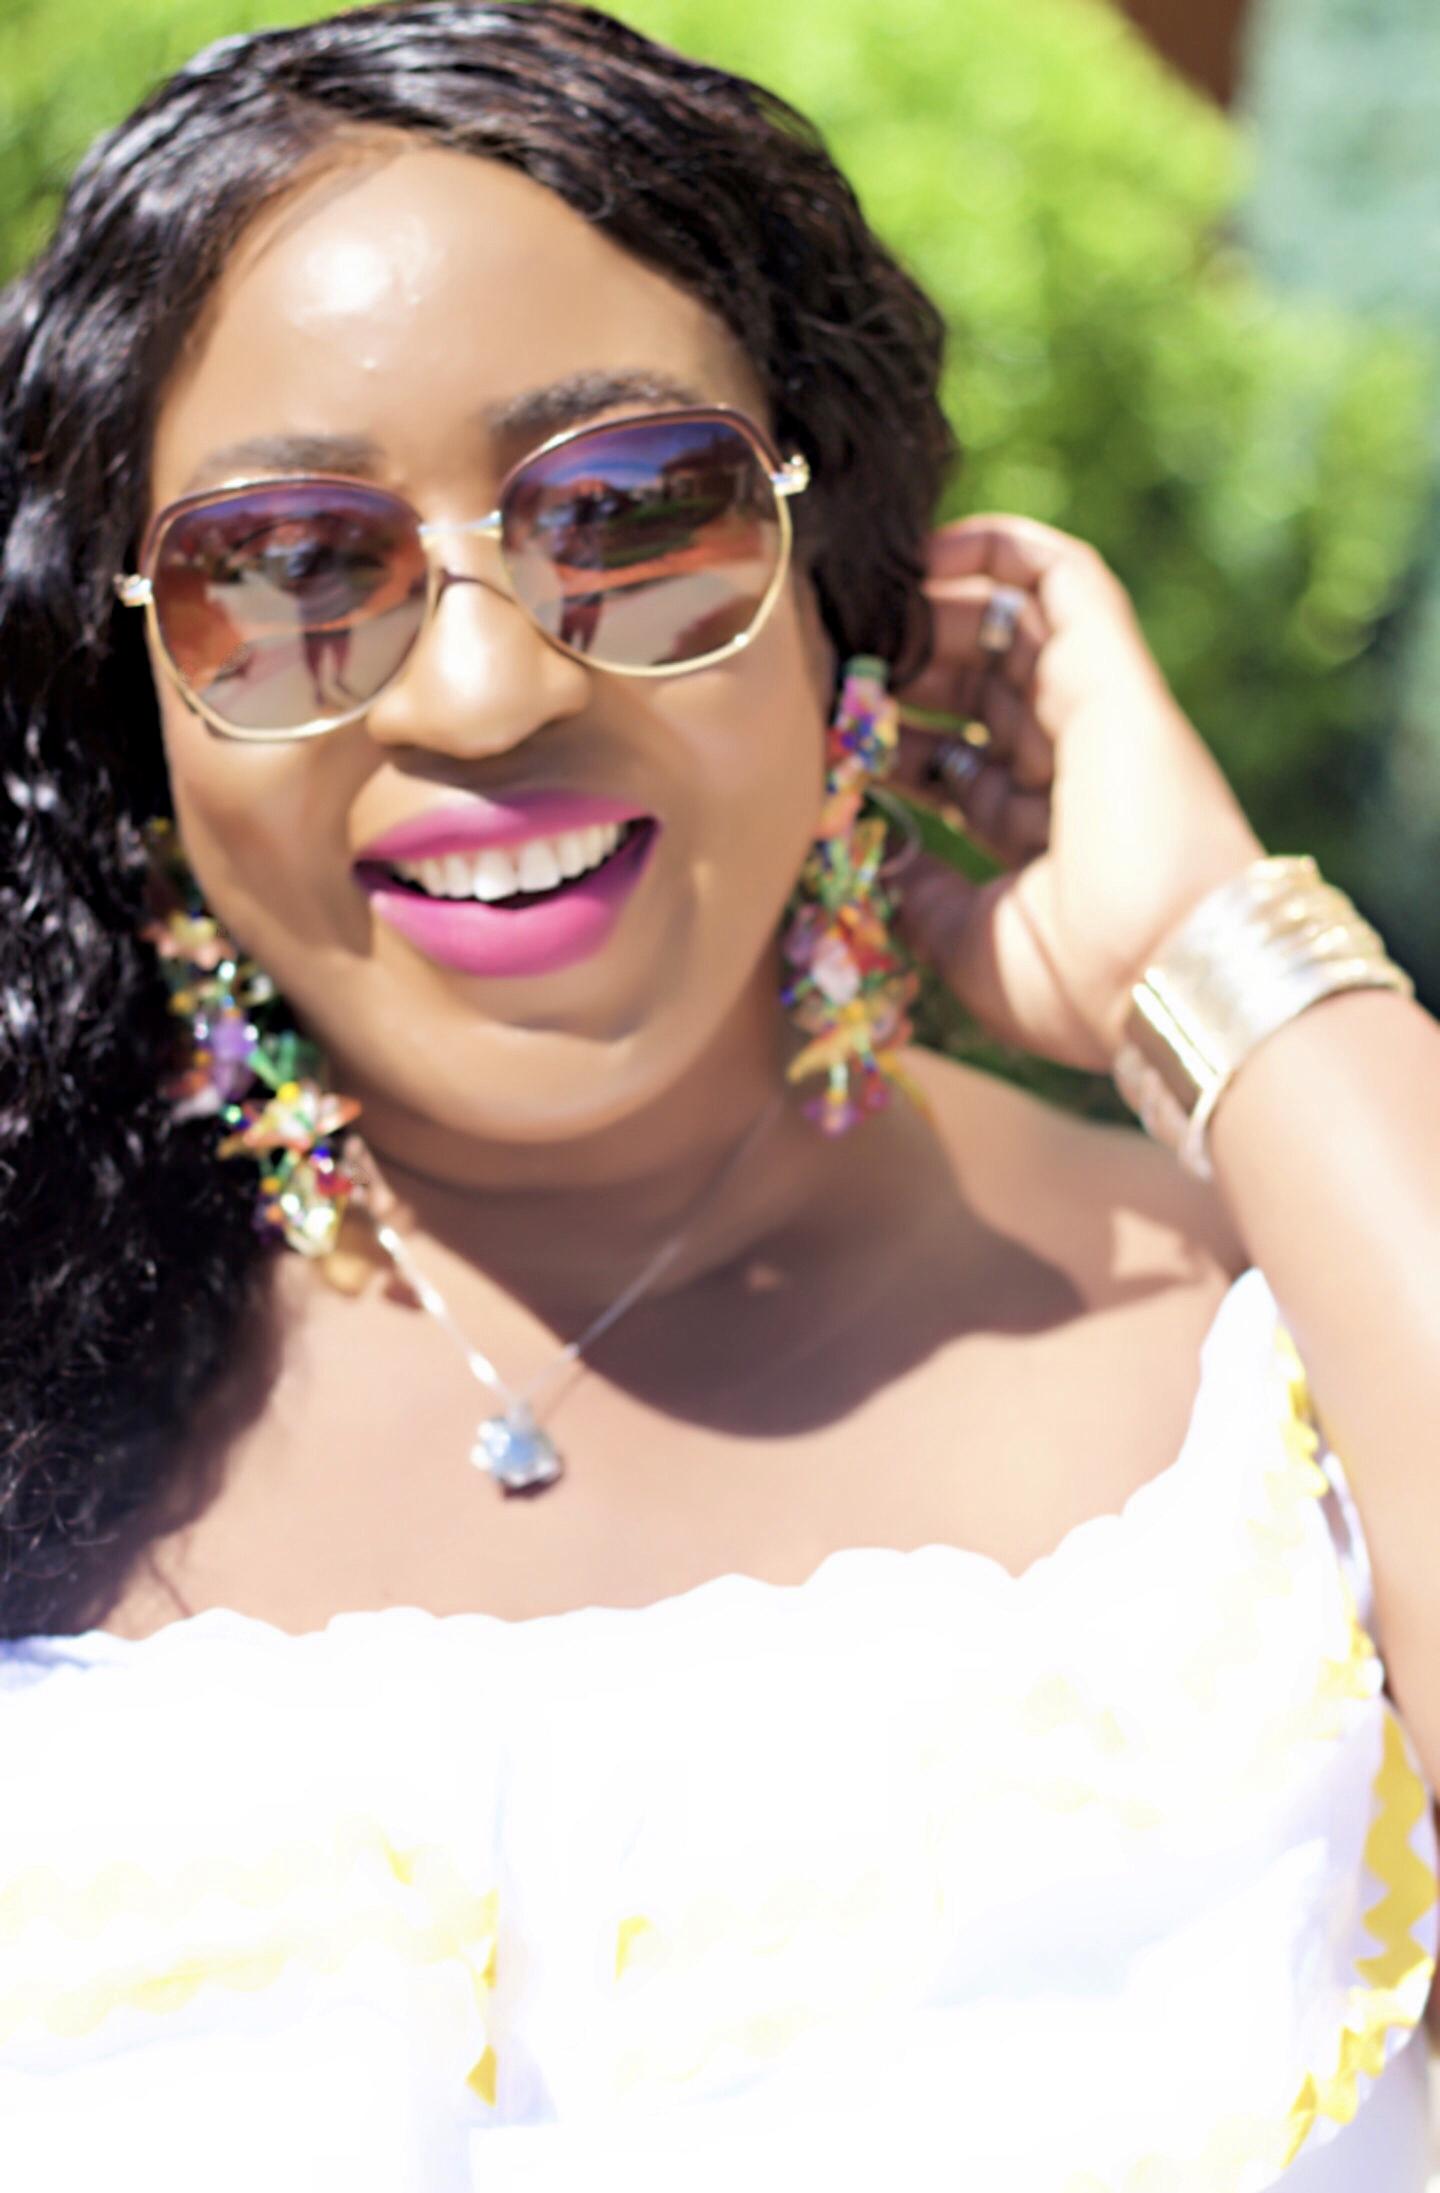 beautidu-bright-smile-colorful-earrings-zara